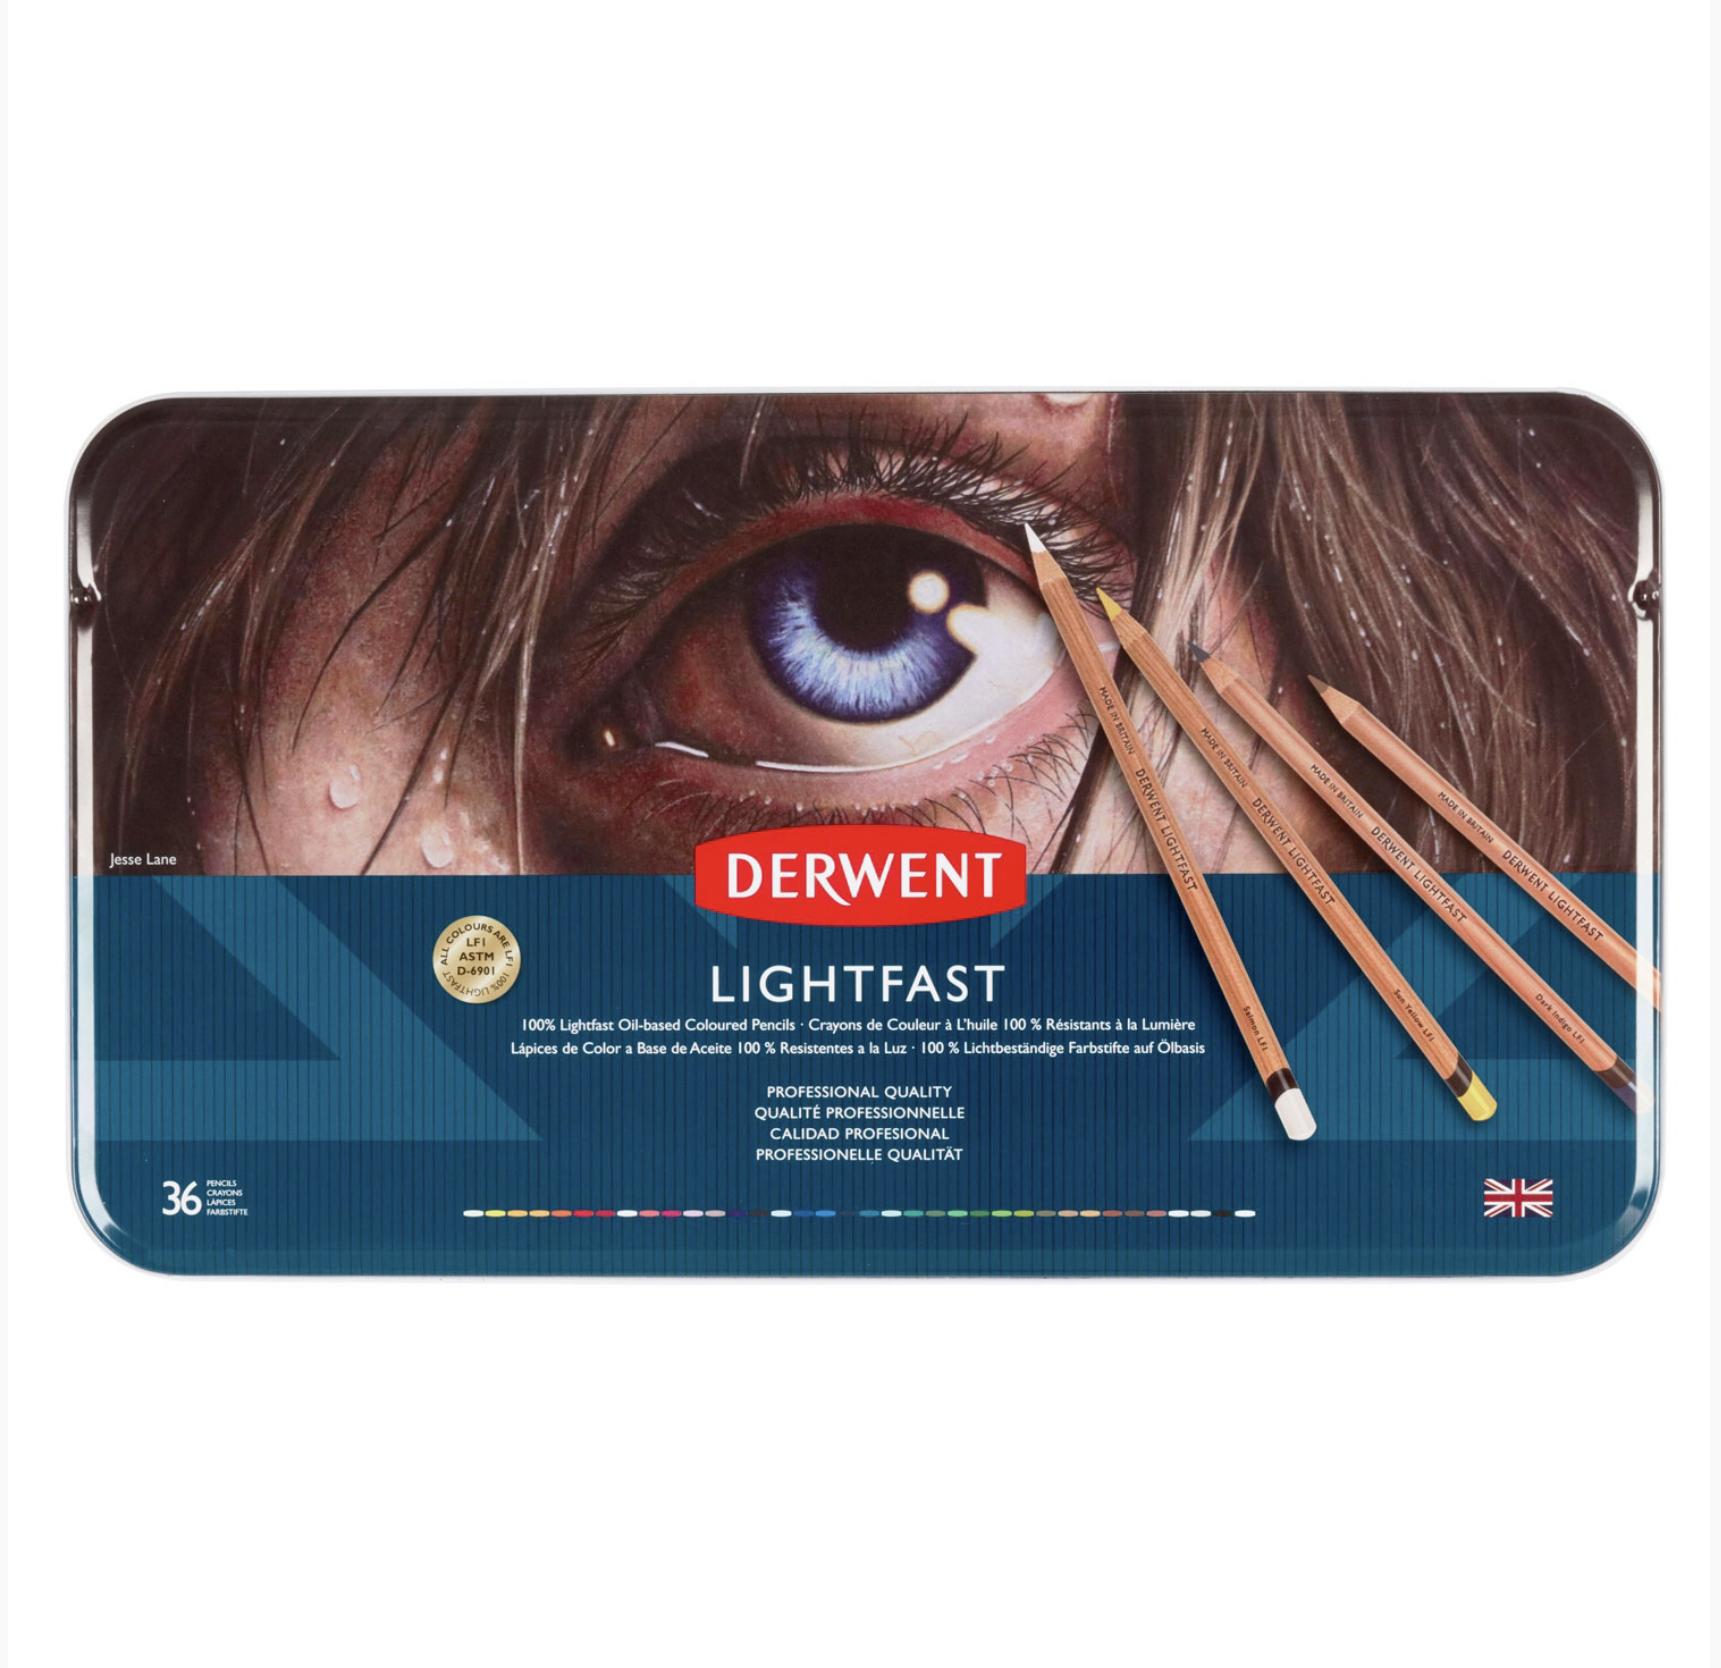 Potloden op oliebasis - Lightfast - set van 36 - Derwent